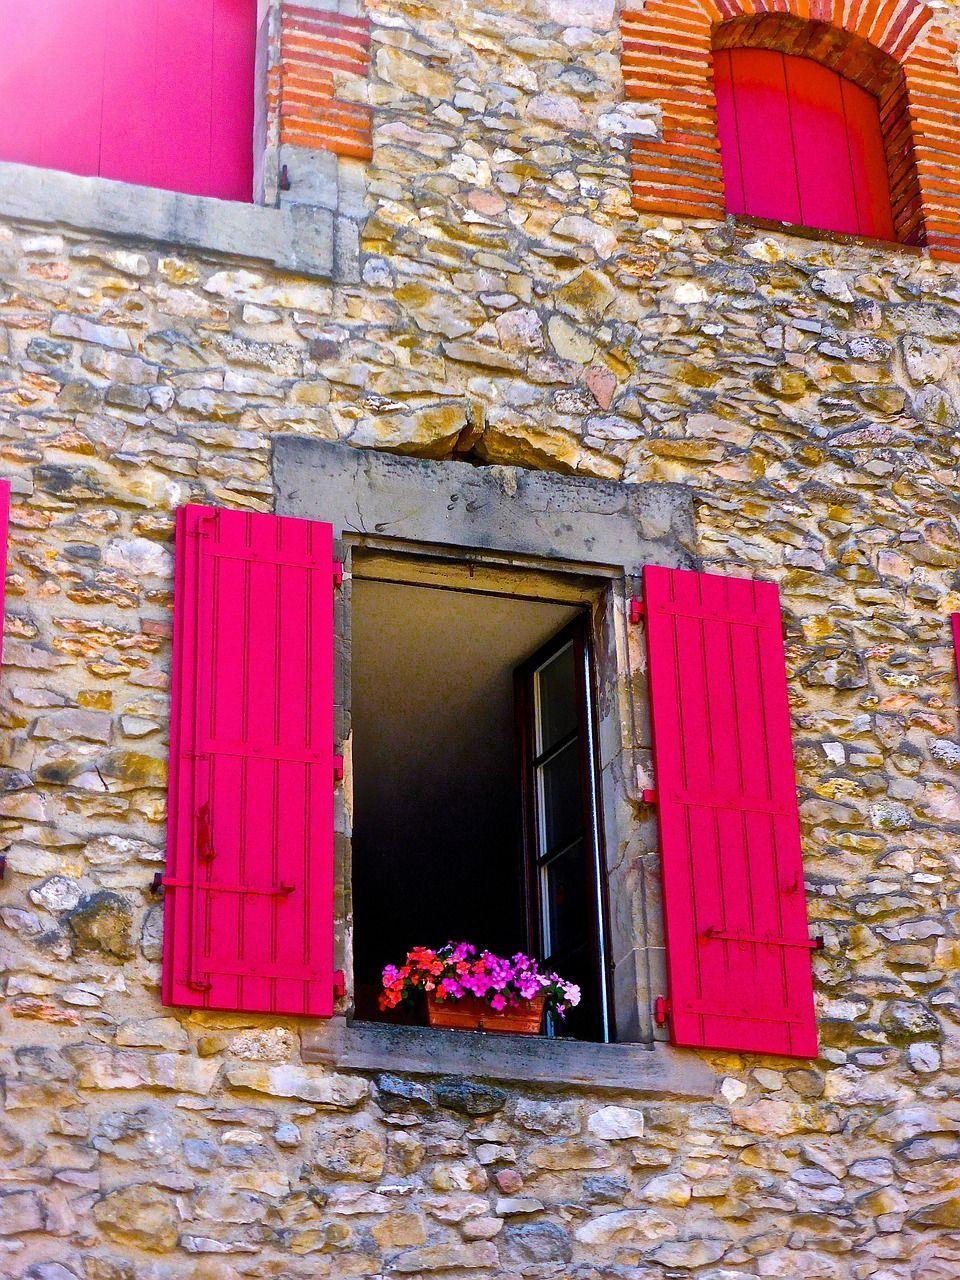 Home decor window  home decor window red stone flowers homedecor window red